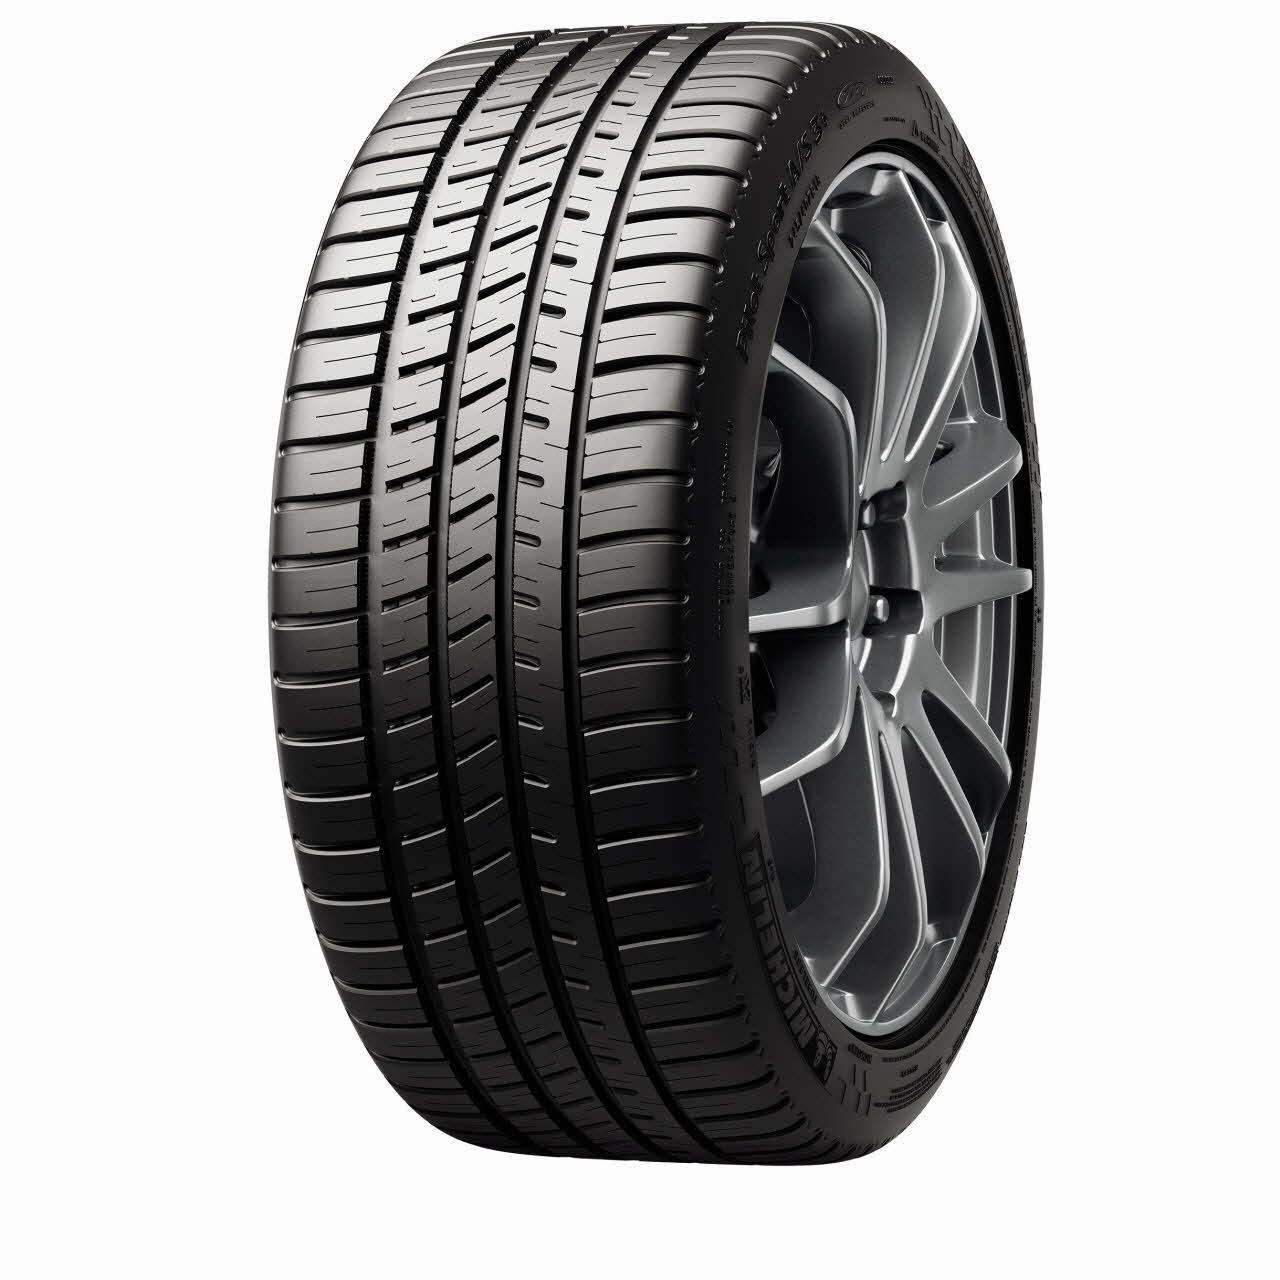 Michelin / Pilot Sport A/S 3